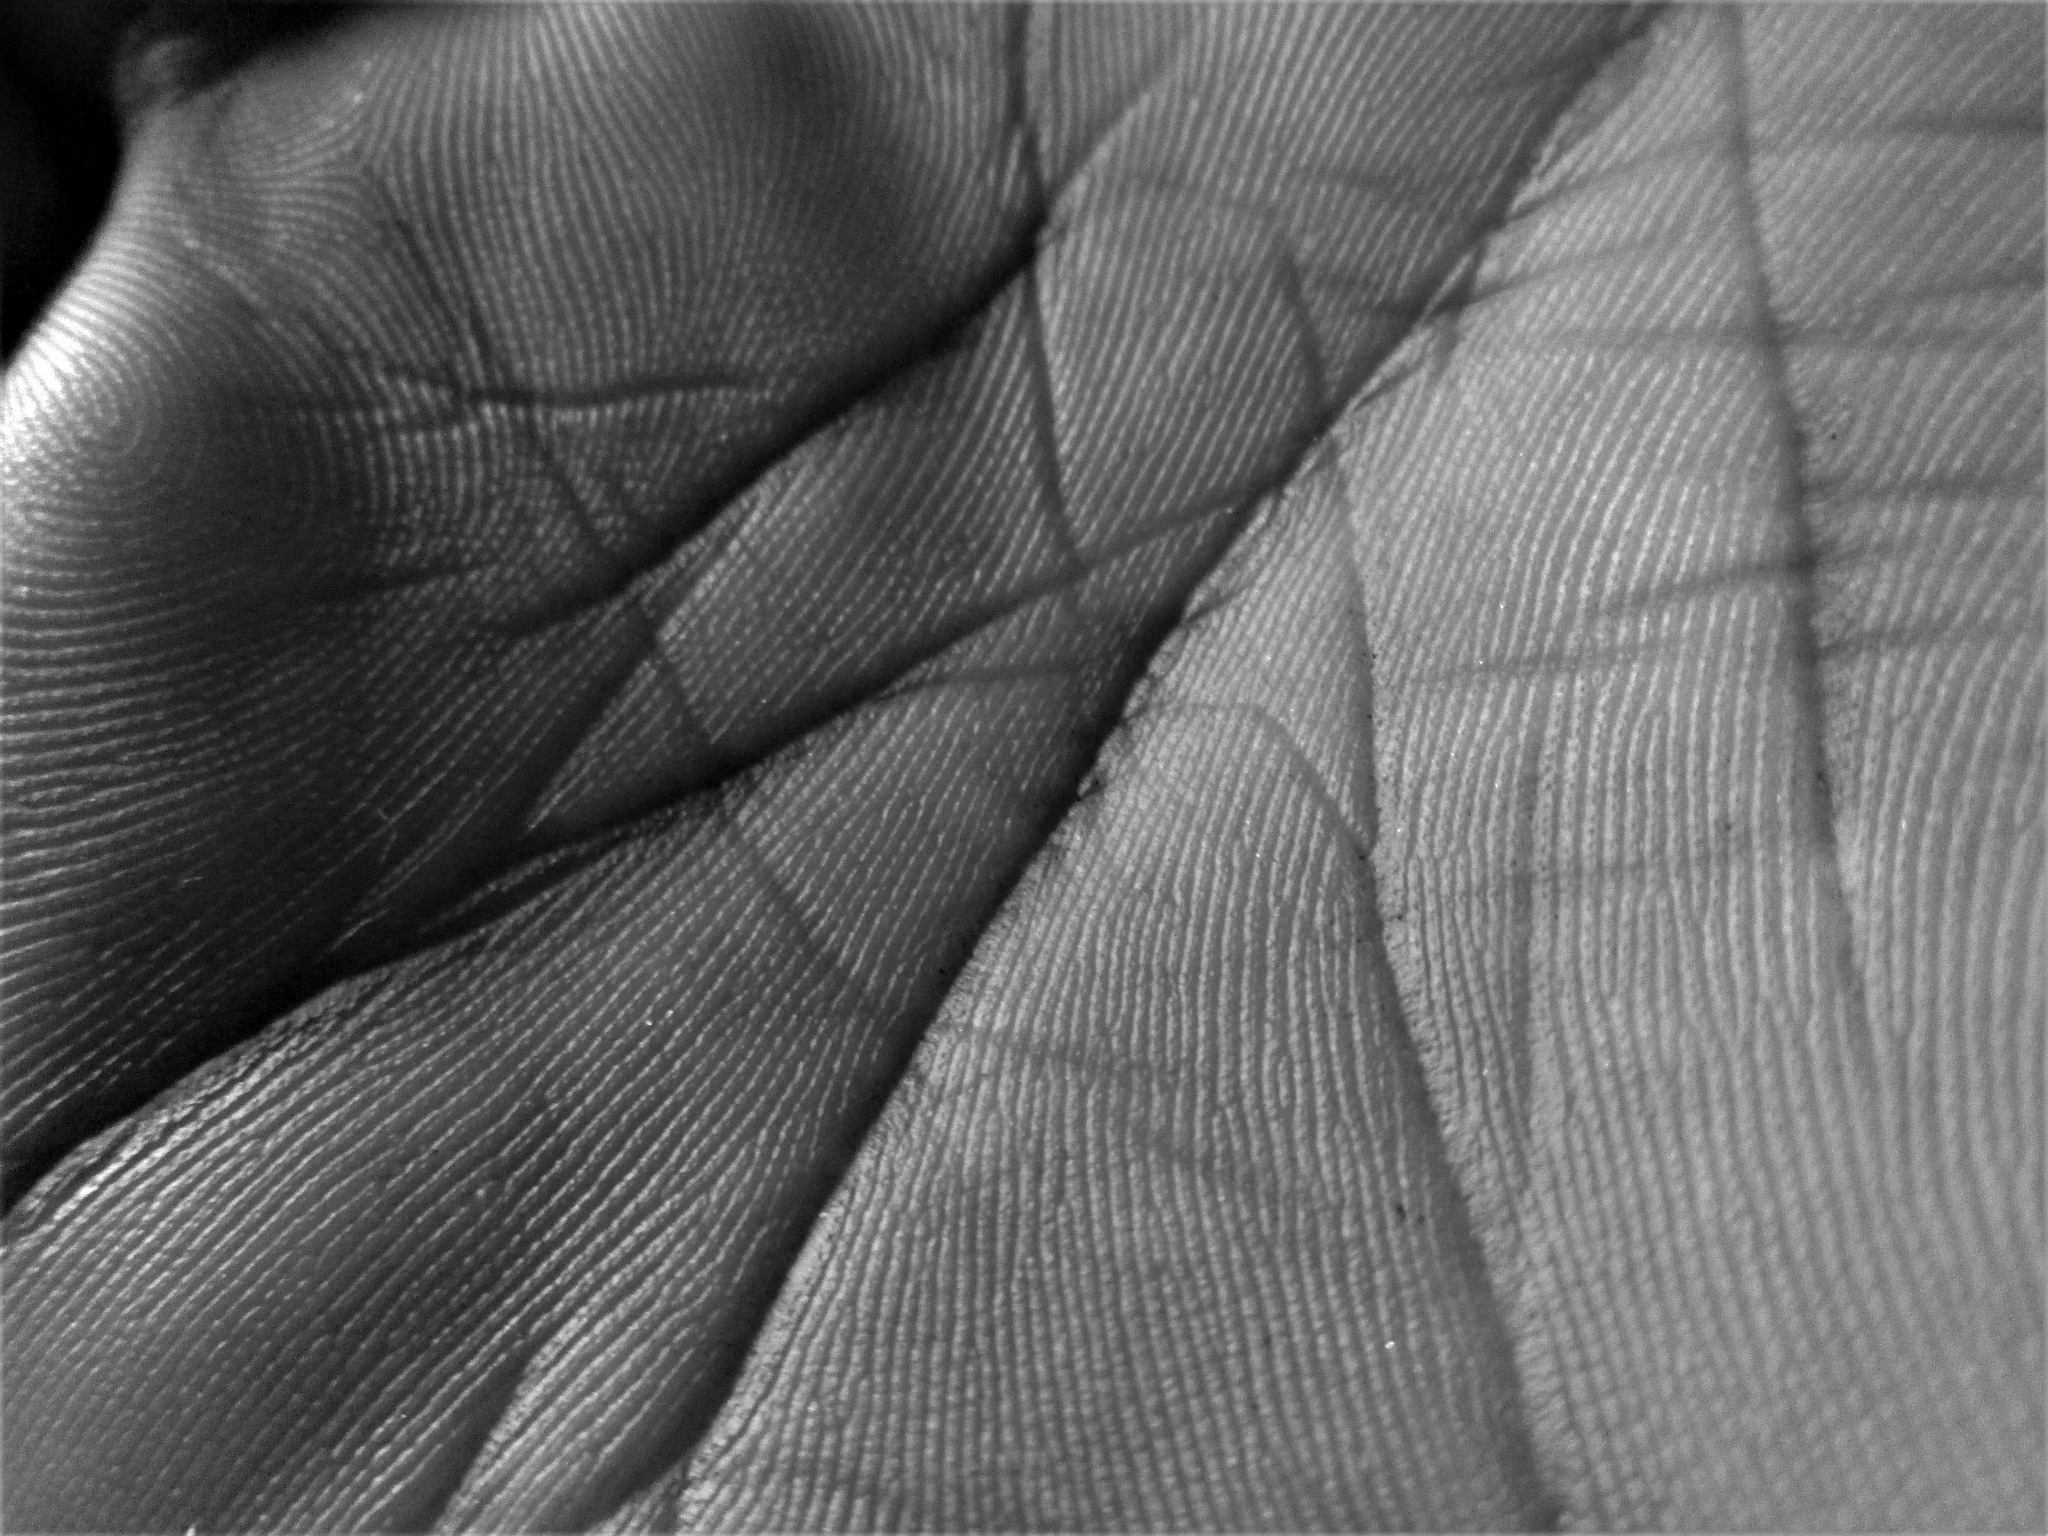 Palm Lines by Siddharth Sanyal